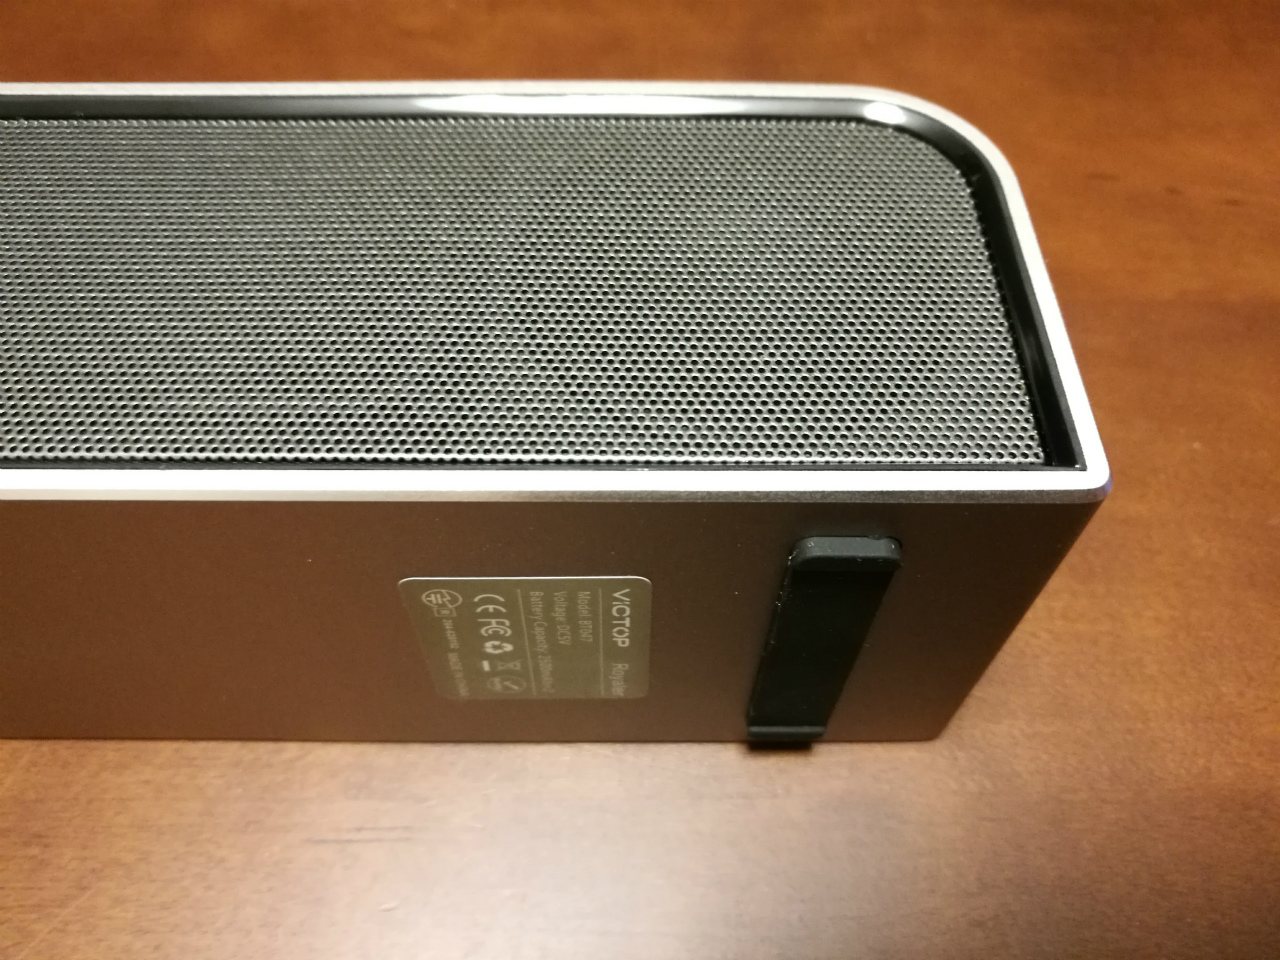 pr-qtuo-royaler-bluetooth-speaker-20w-04